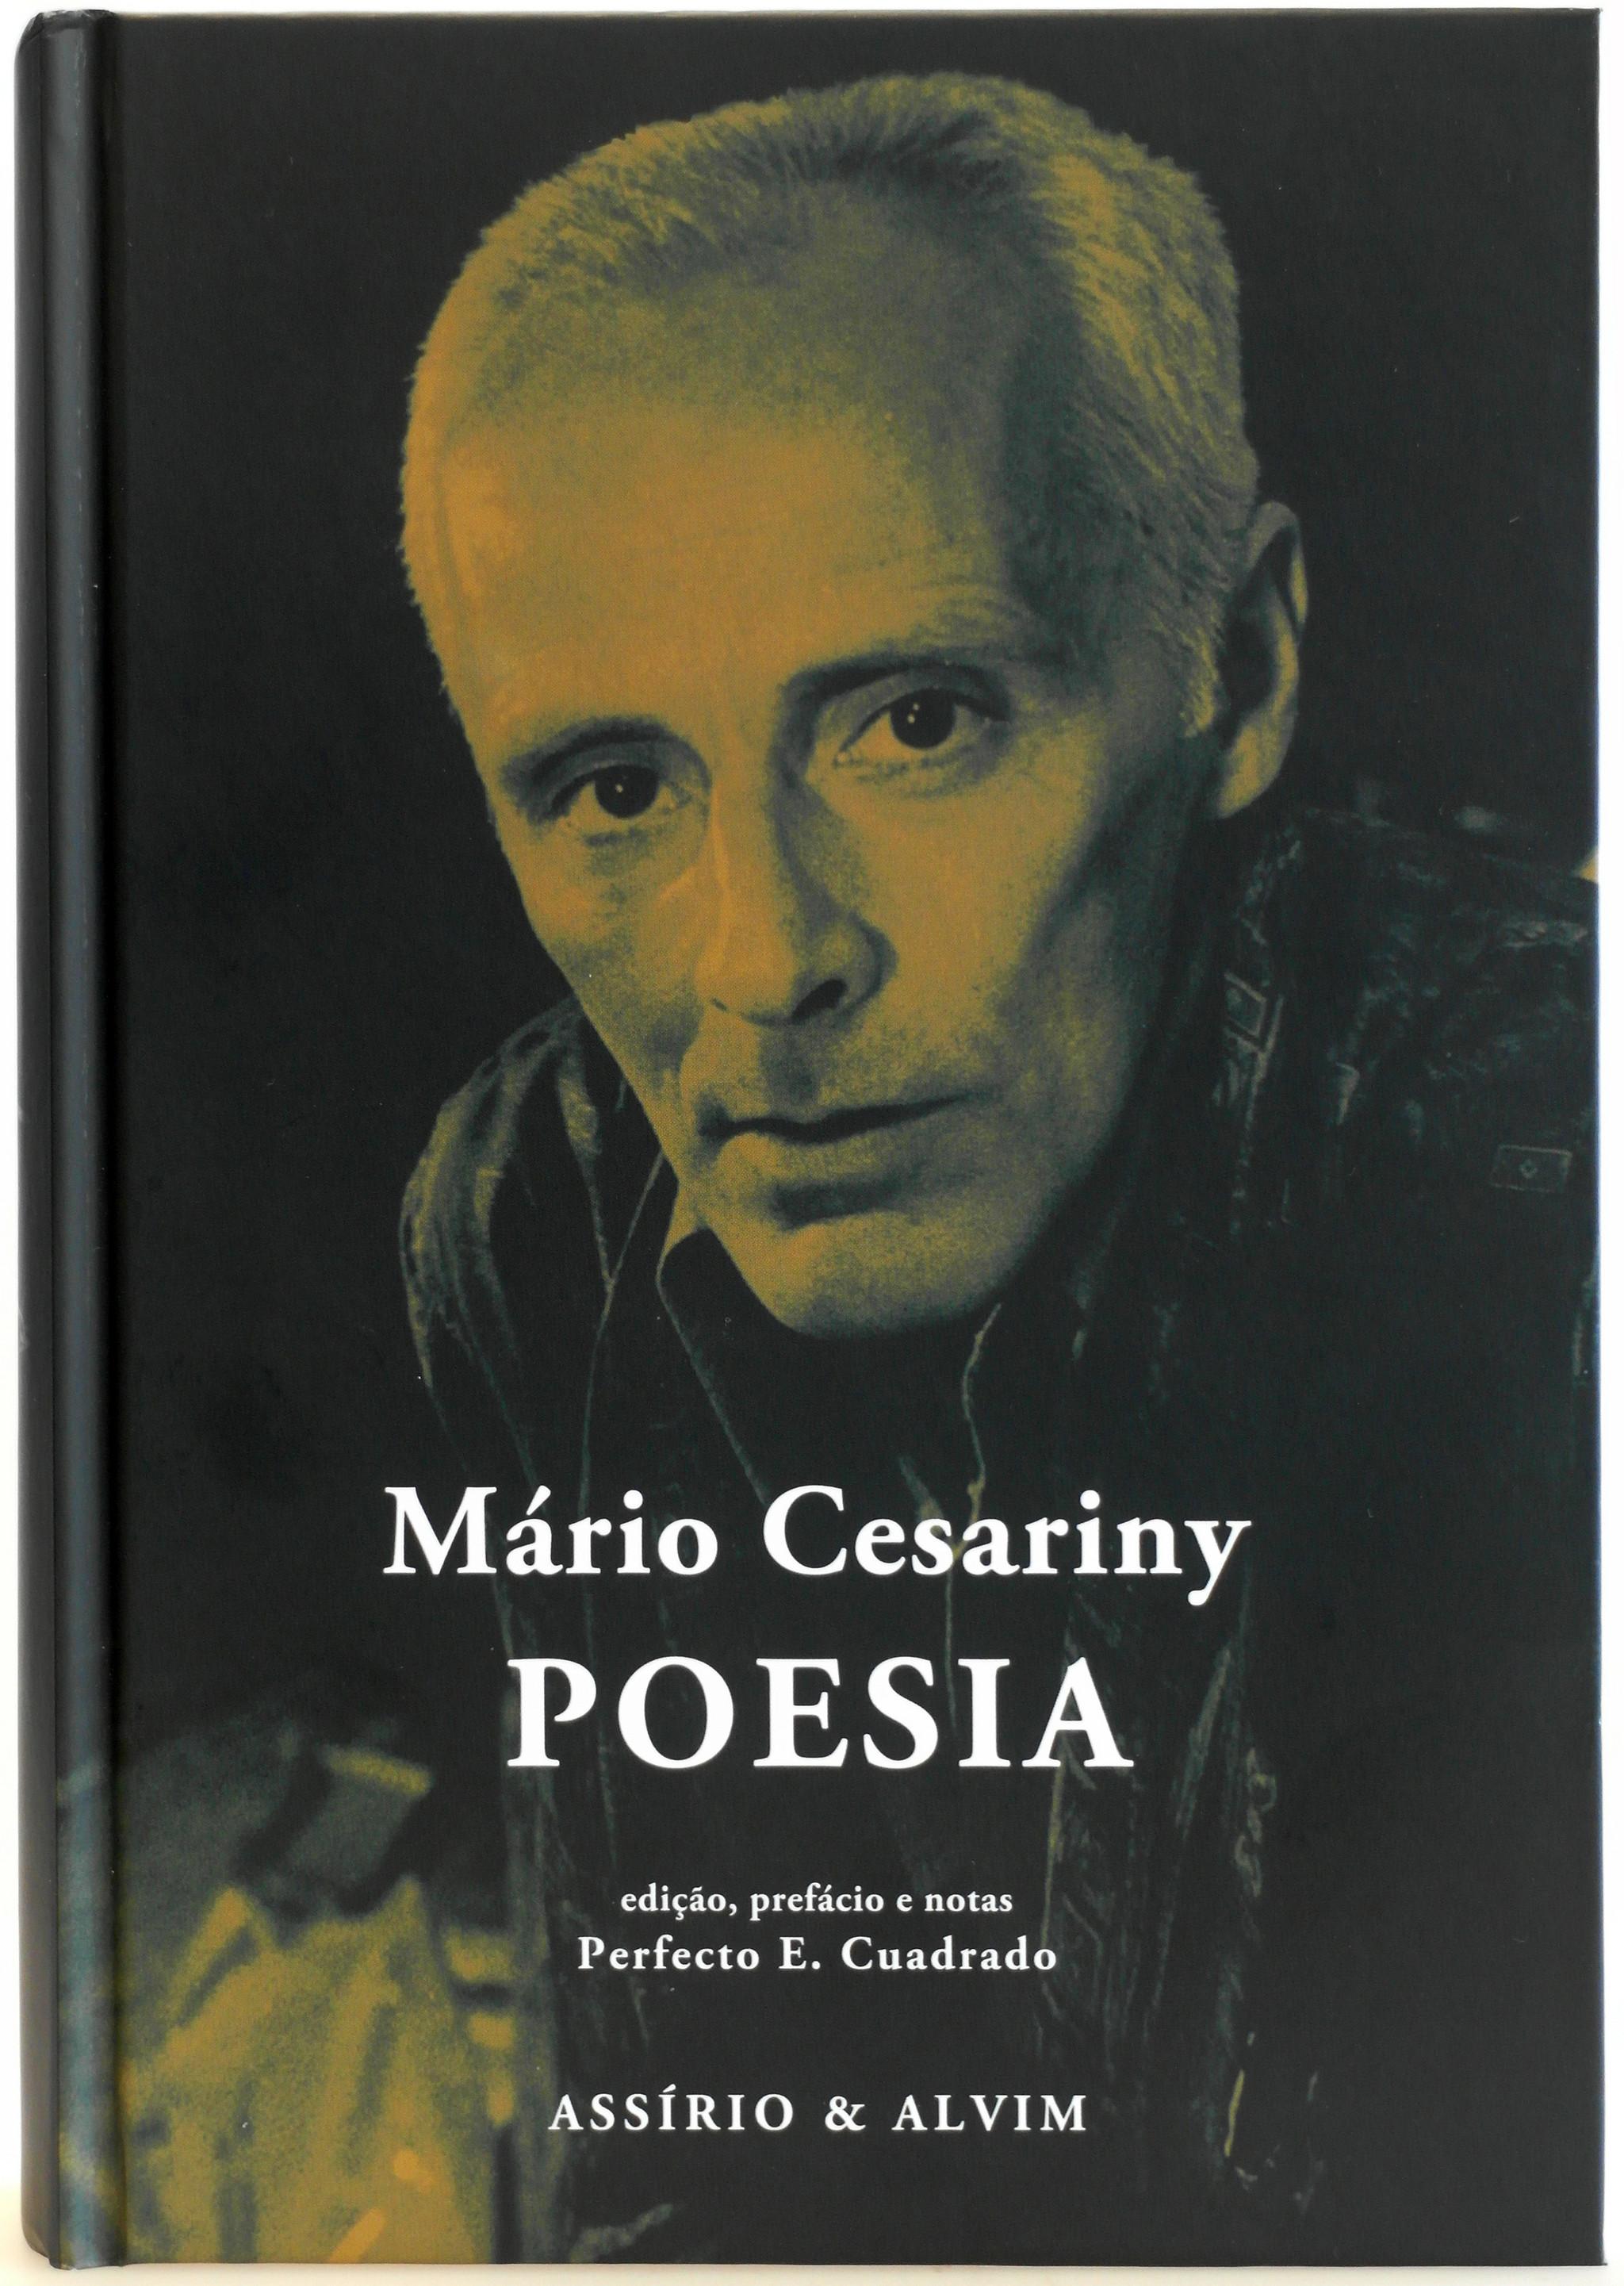 livro Poesia de Mario Cesariny.jpg